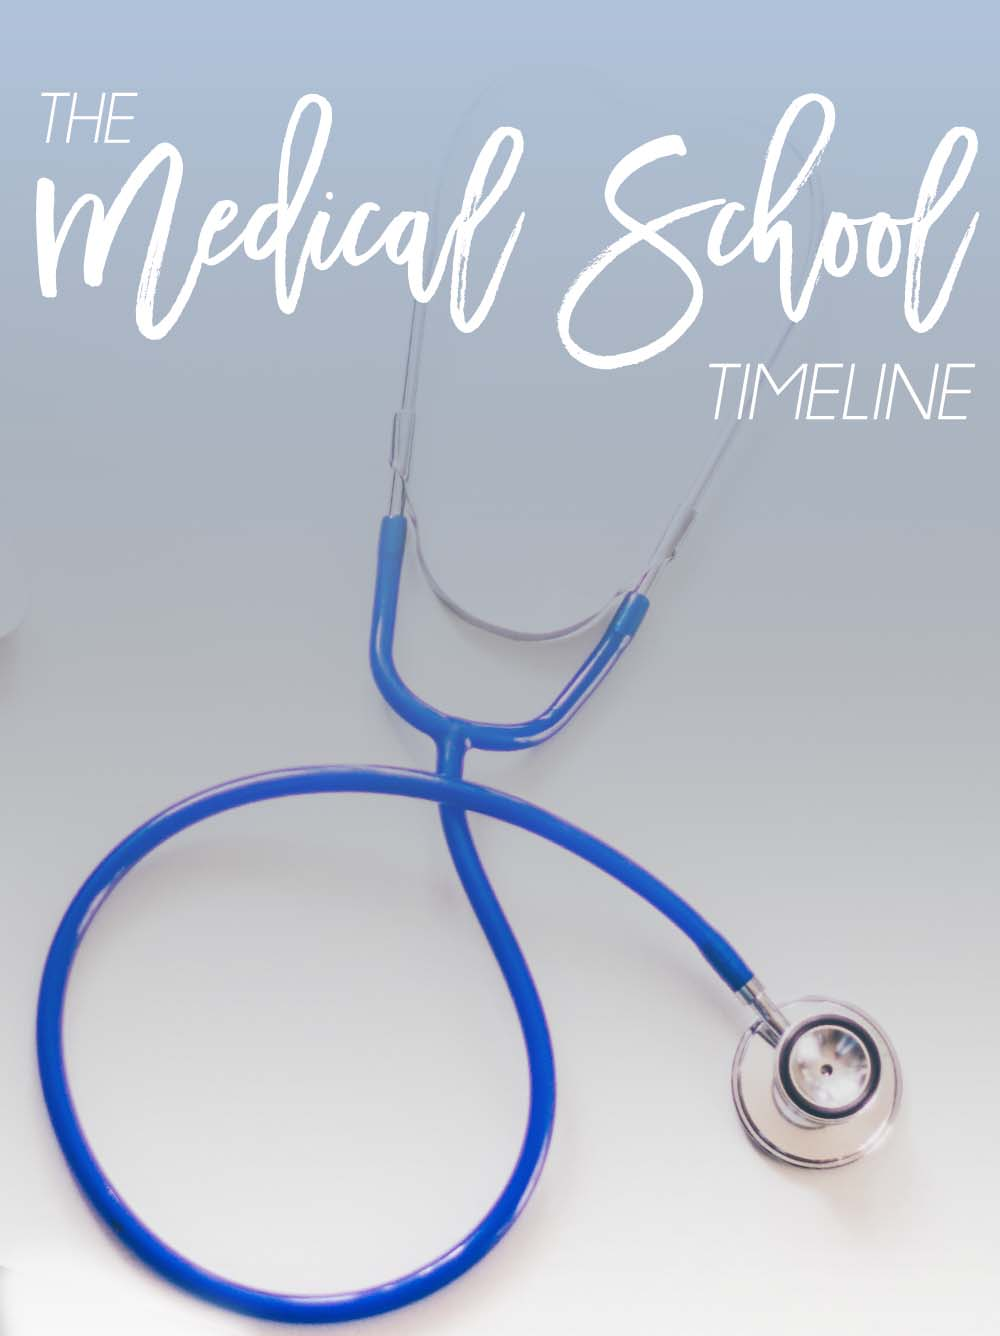 The Medical School Timeline